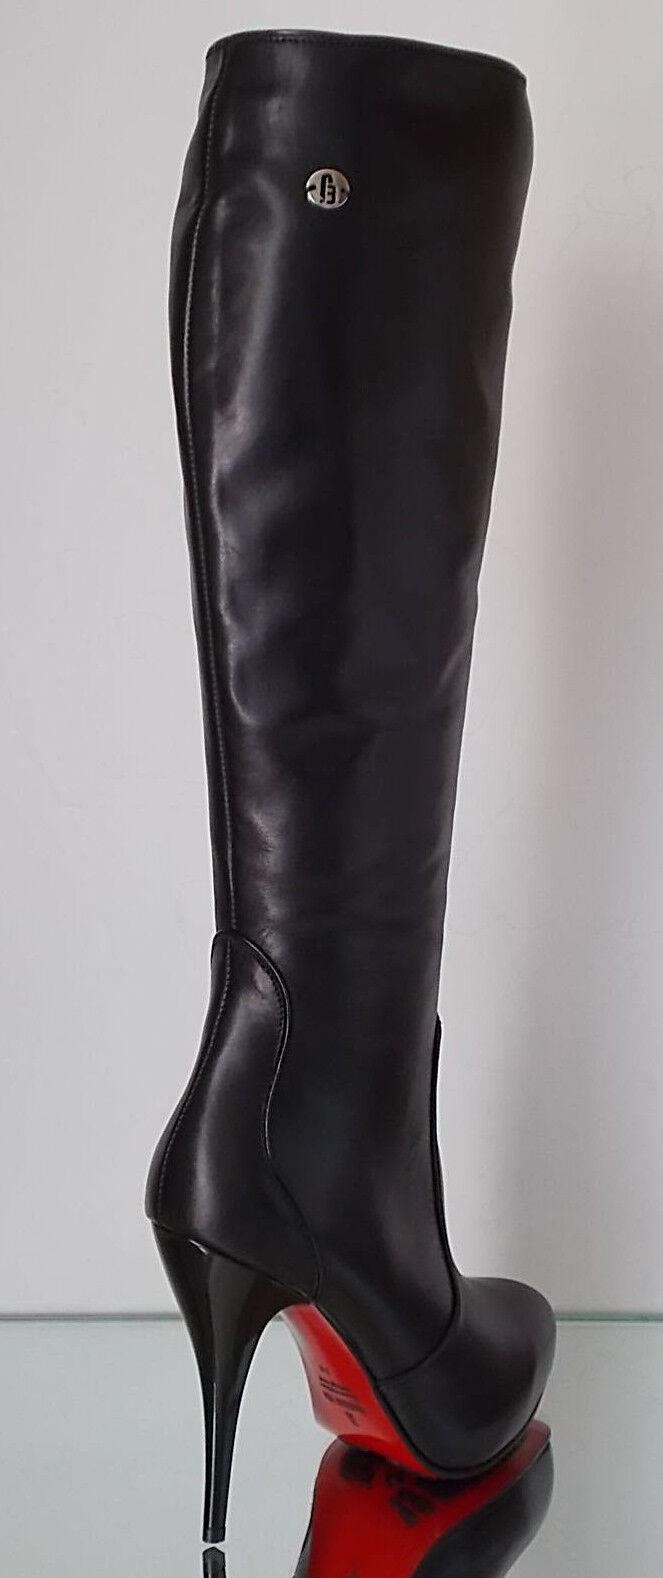 Damen HIGH HEELS Stiefel Echtleder Exklusiv 1255 Italienische Mode NEU & OVP